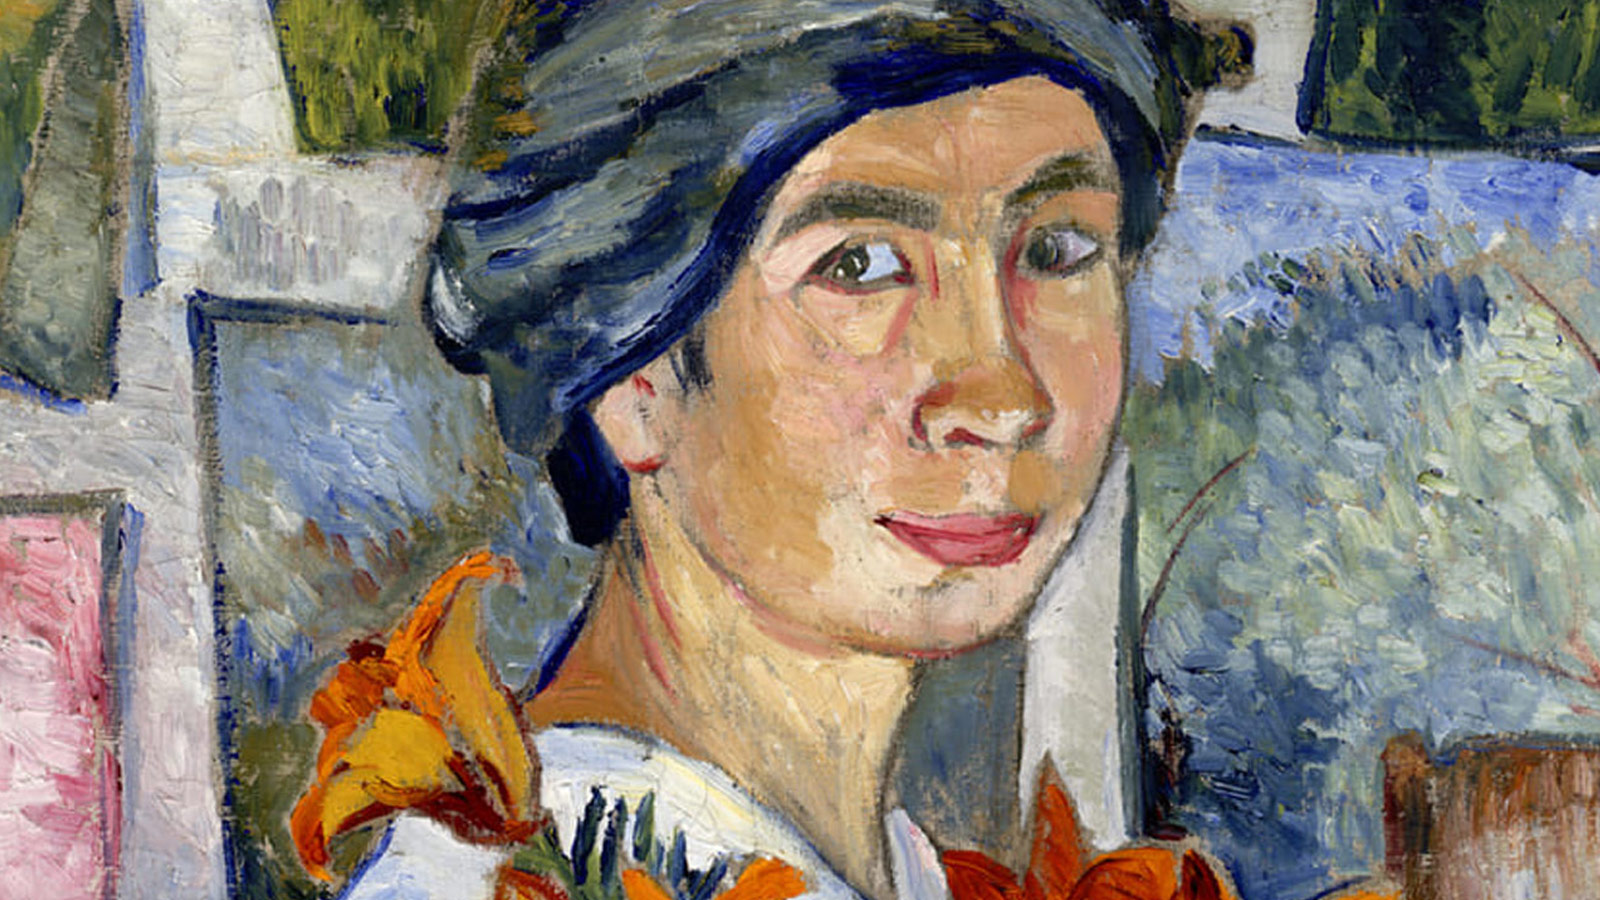 natalia-goncharova-florence